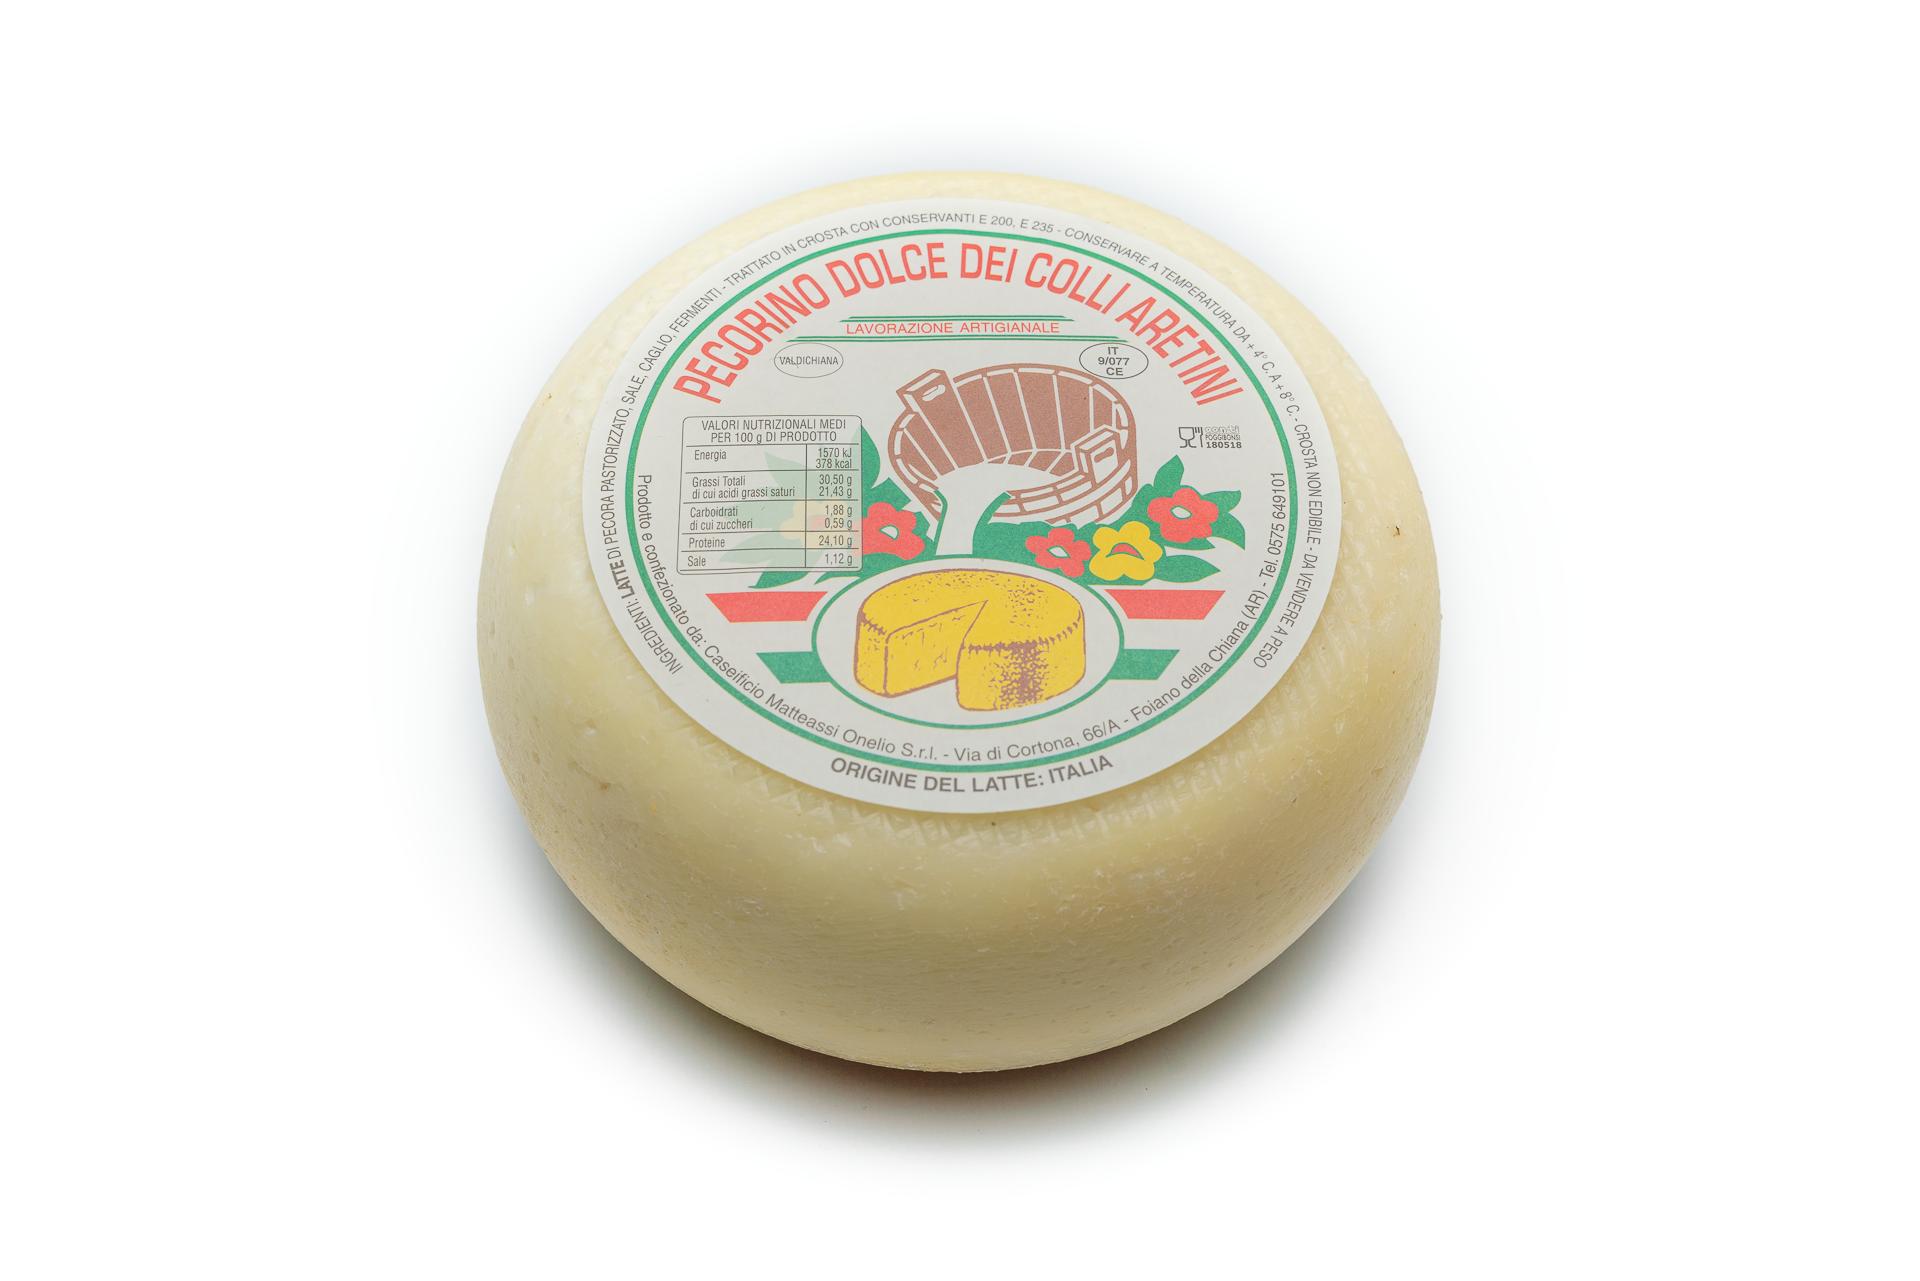 Pecorino Dolce Colle Aretini